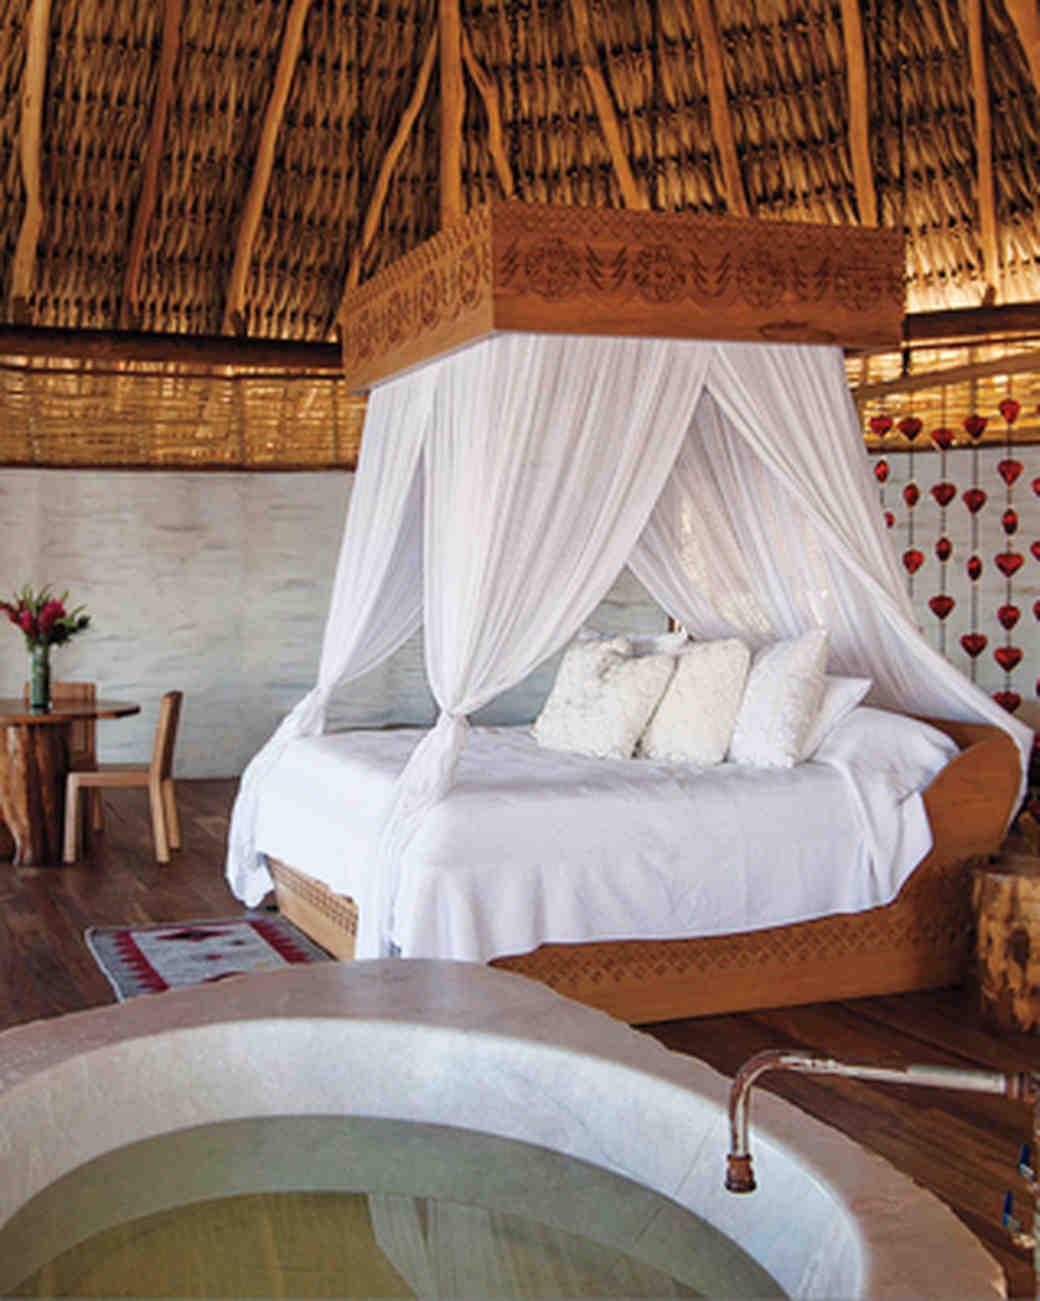 hotelito-desconocido-suite-rosa-eva-sica-9-s111679.jpg